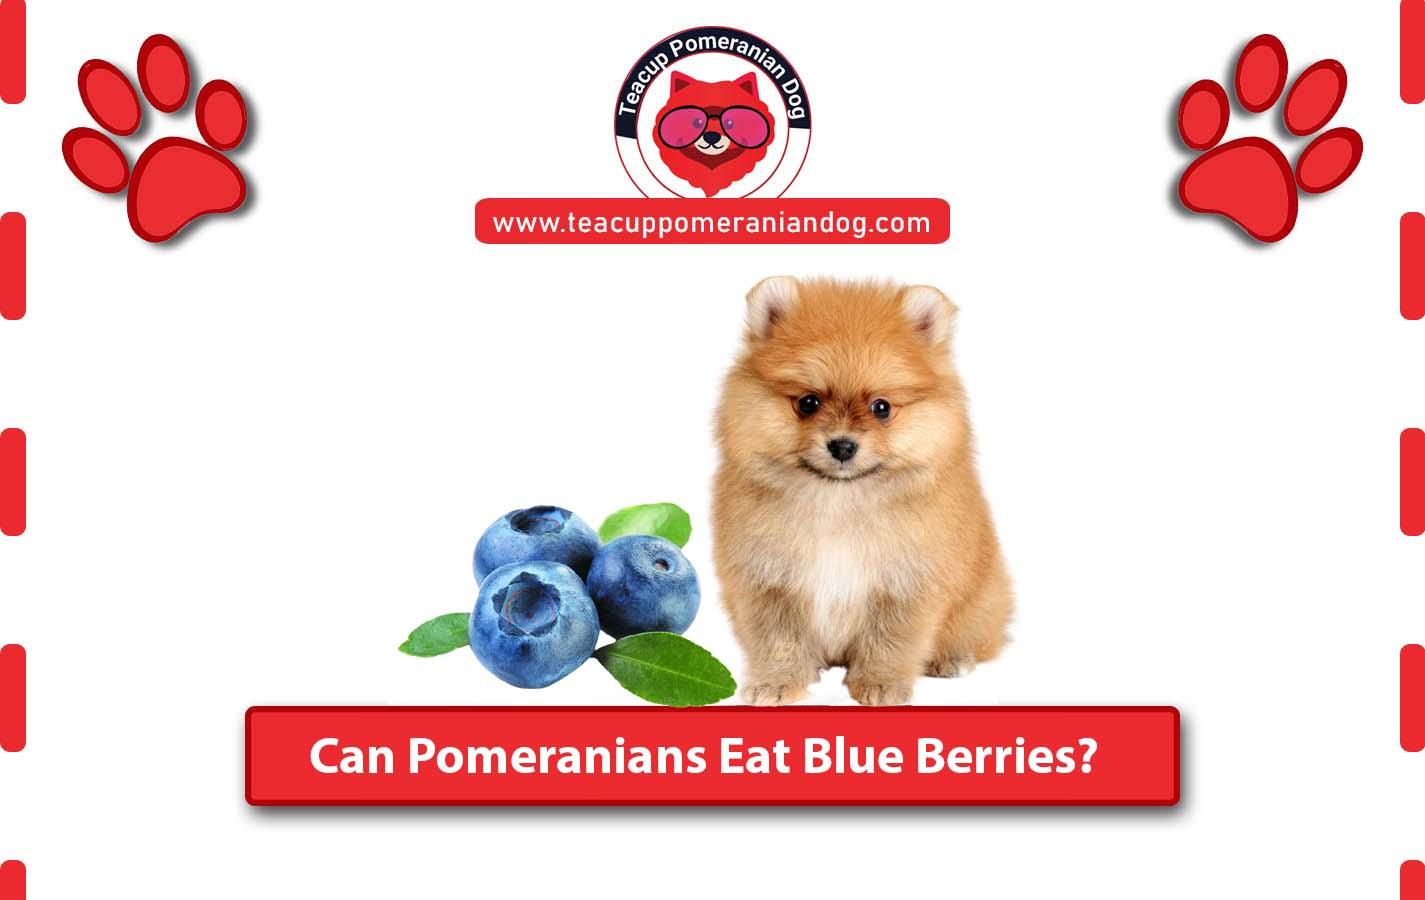 can pomeranian eat bullberrries.